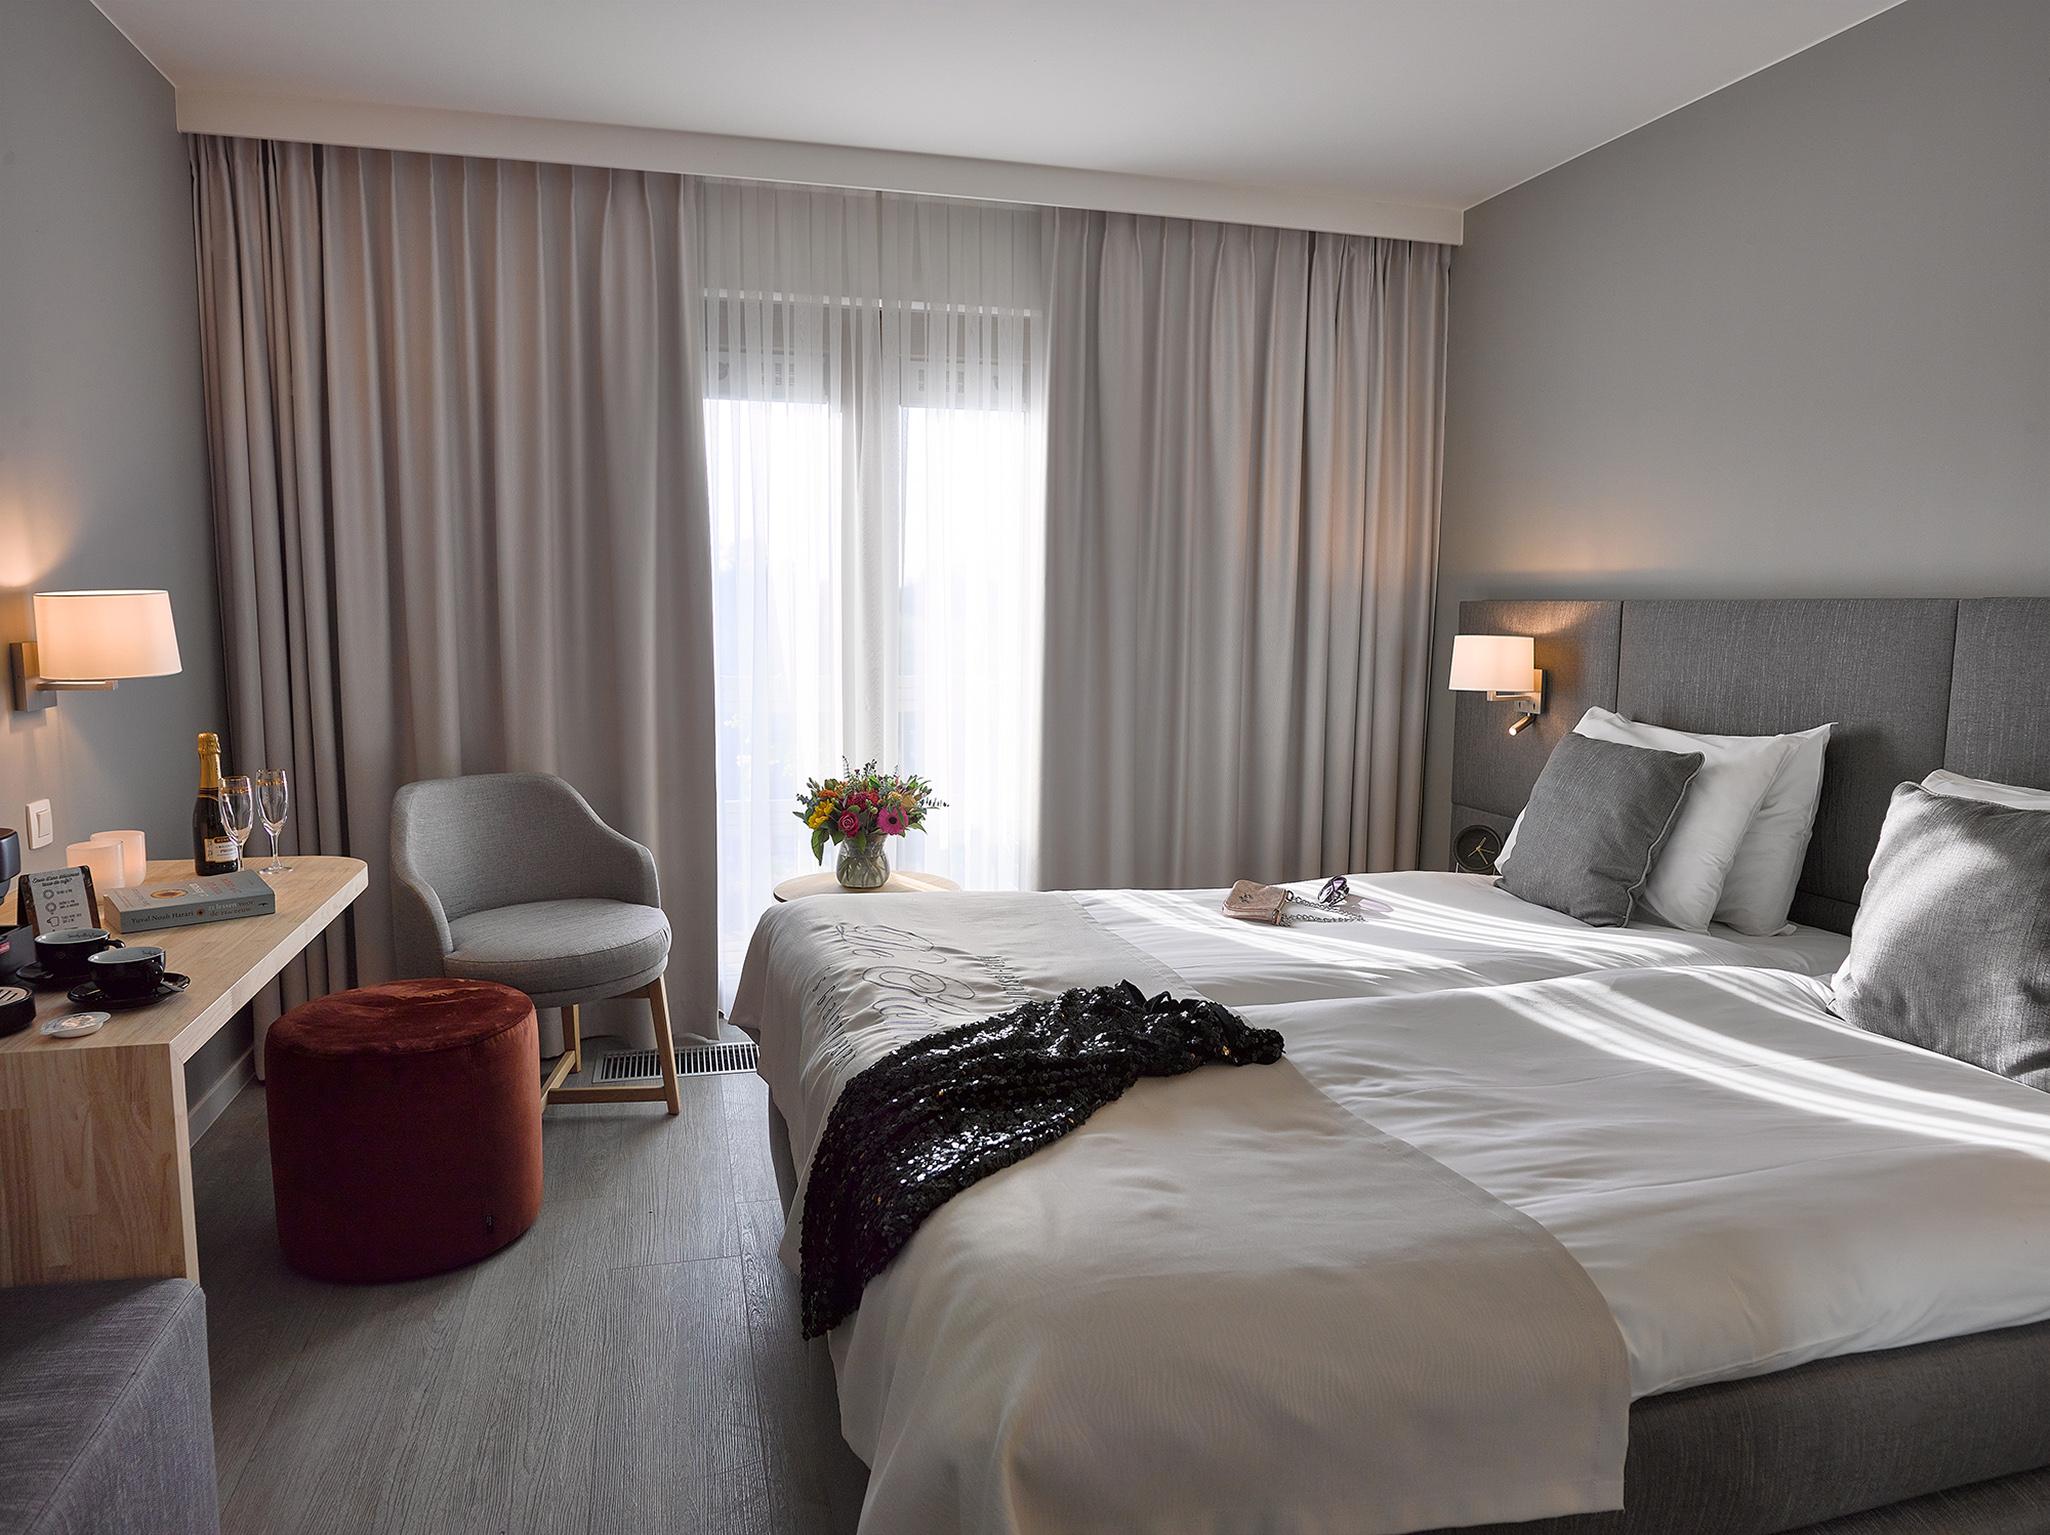 Welkom in Hotel-Restaurant De Kommel - Hotel De Kommel